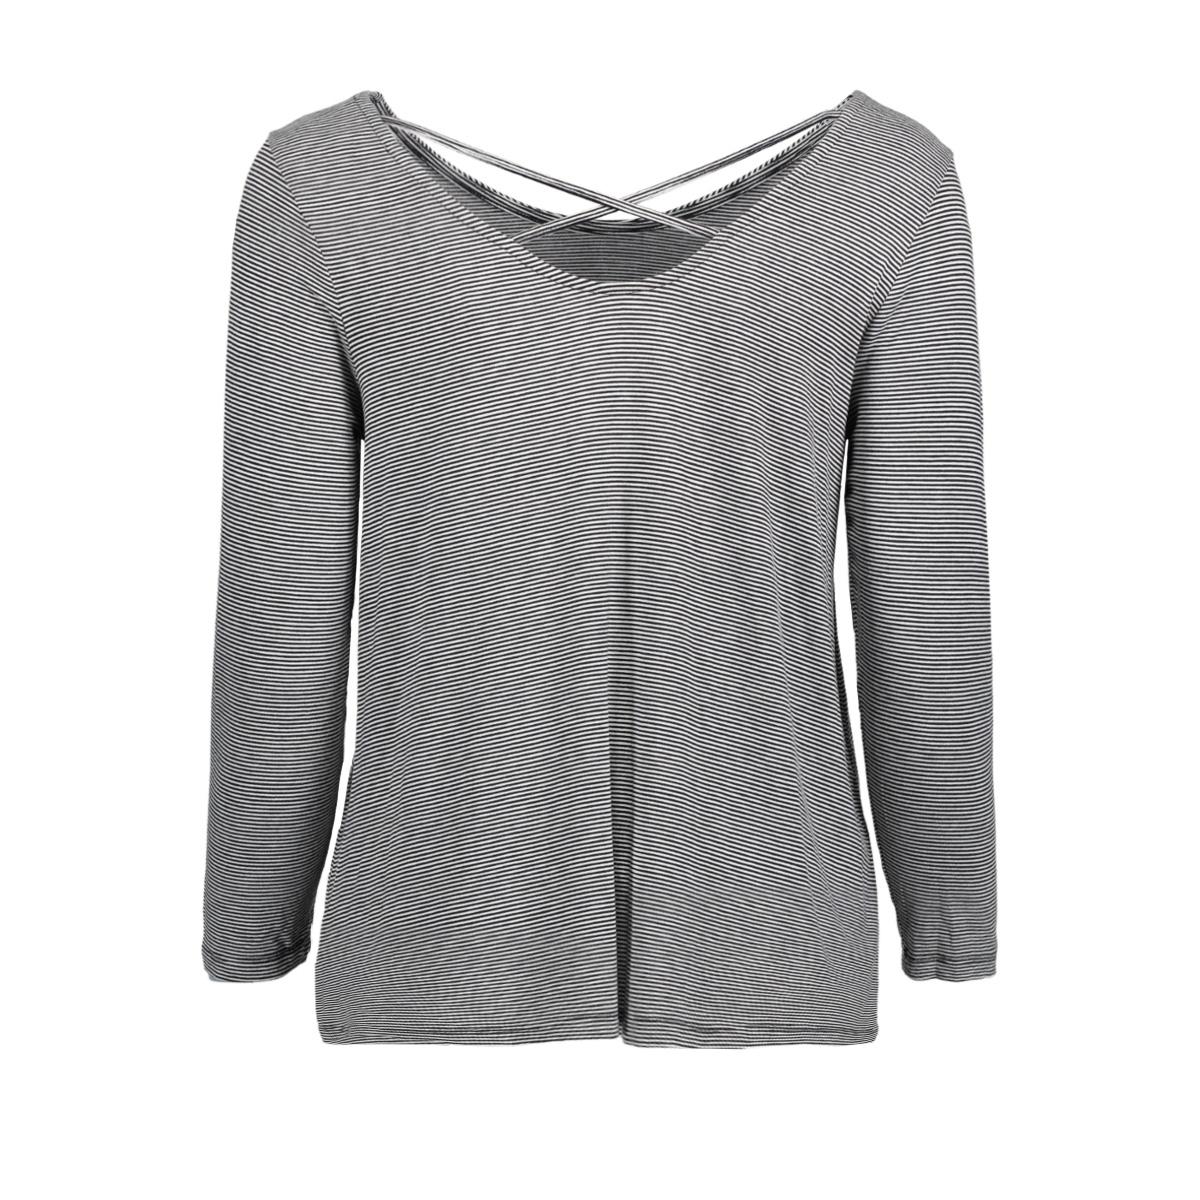 1055063.00.71 tom tailor t-shirt 2998